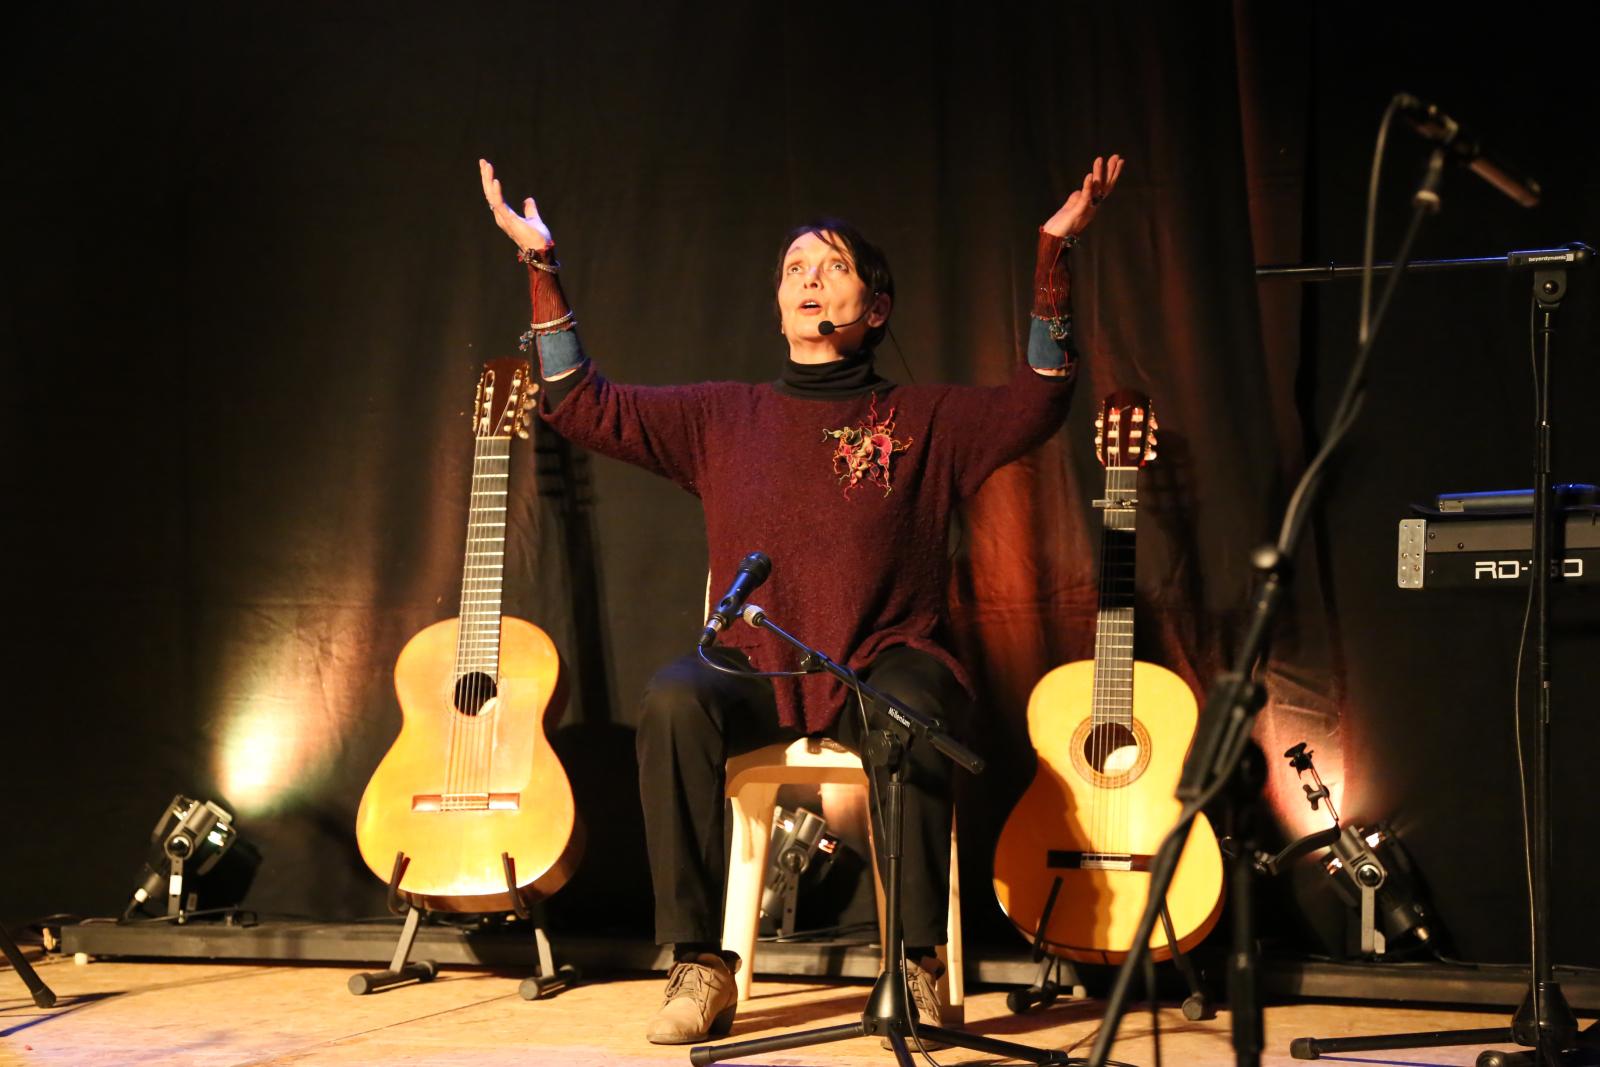 Respirer Chanter Parler - Les Mercredis chantants L'ARCHE 92